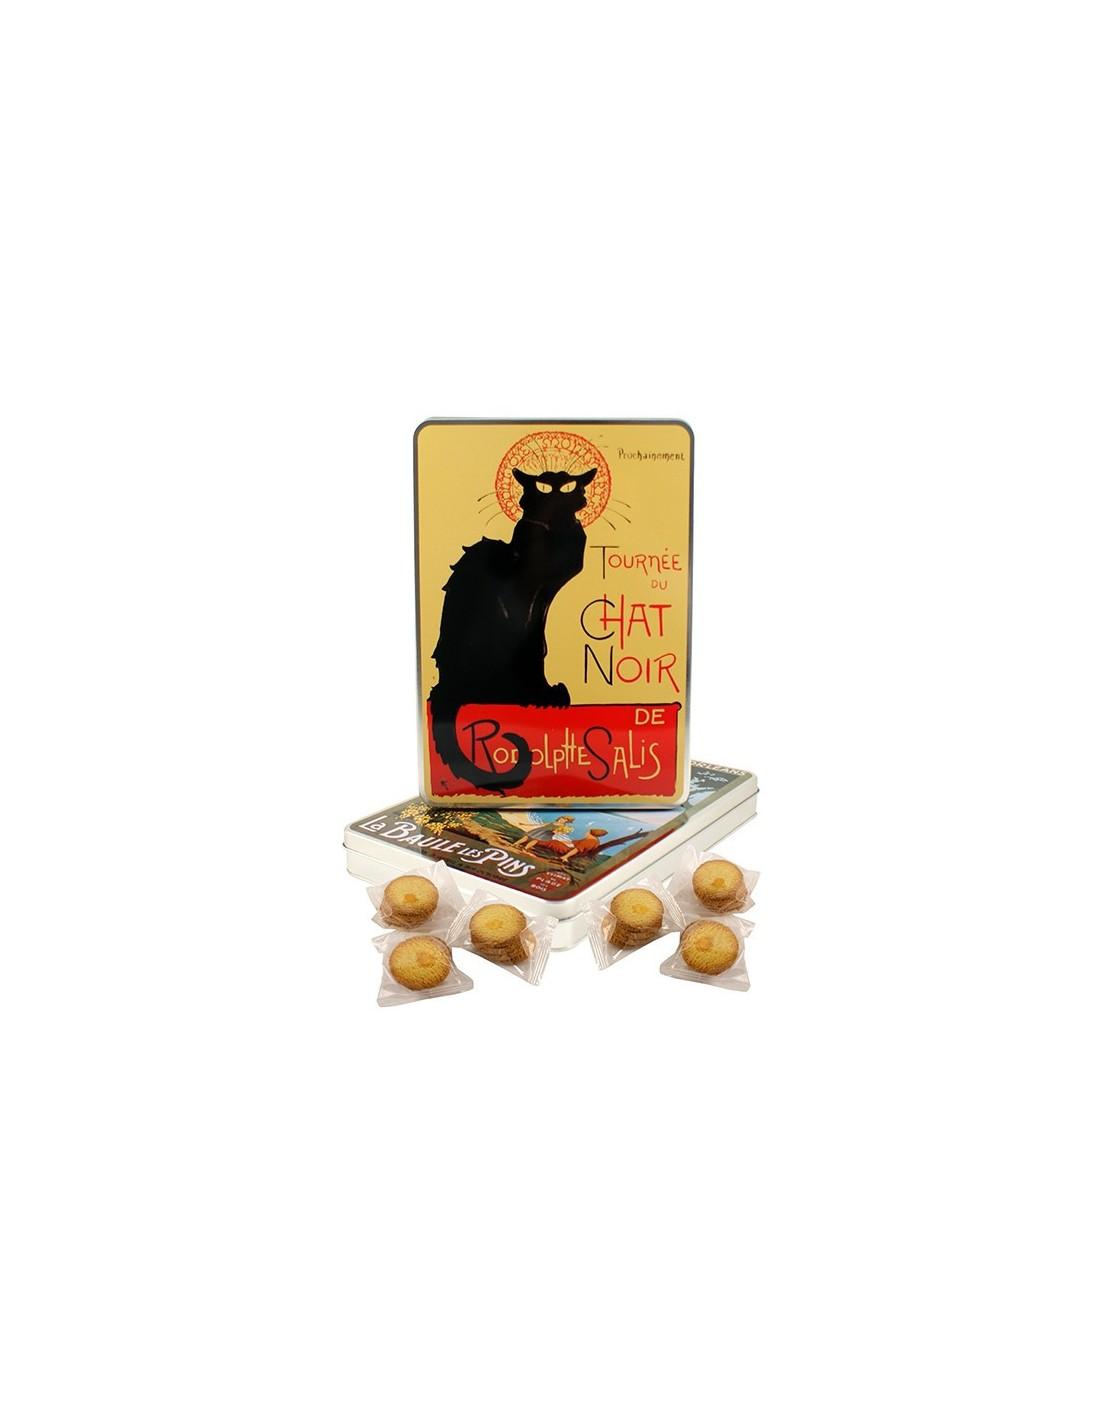 bo te a4 tourn e chat noir garnie produits r gionaux biscuits bretons. Black Bedroom Furniture Sets. Home Design Ideas